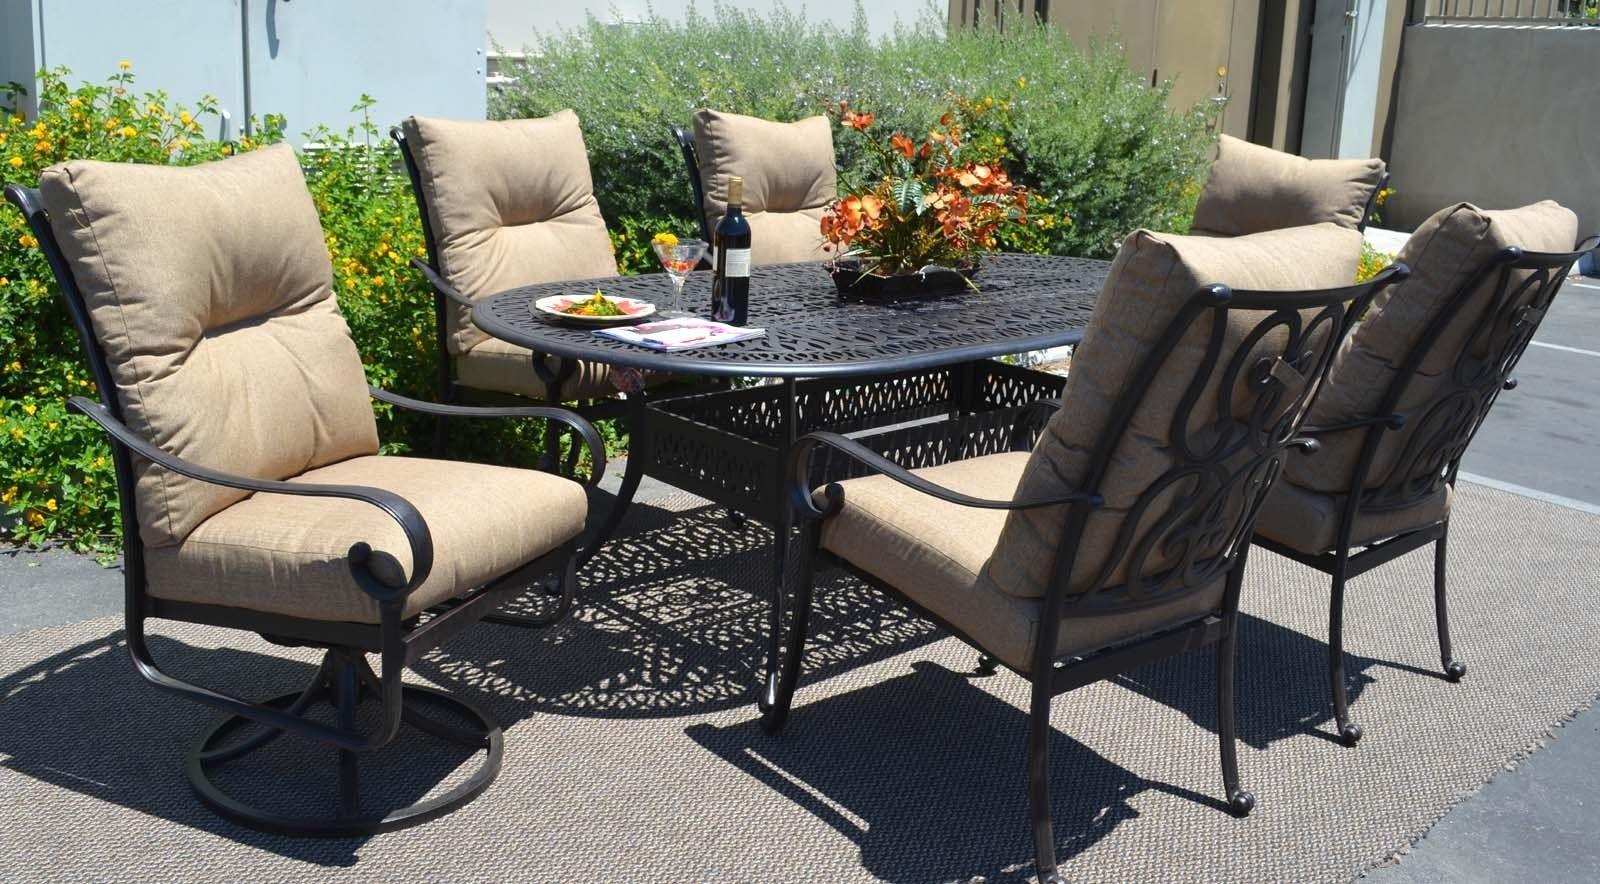 Patio 7 piece dining set oudoor cast aluminum furniture chairs Sunbrella Bronze